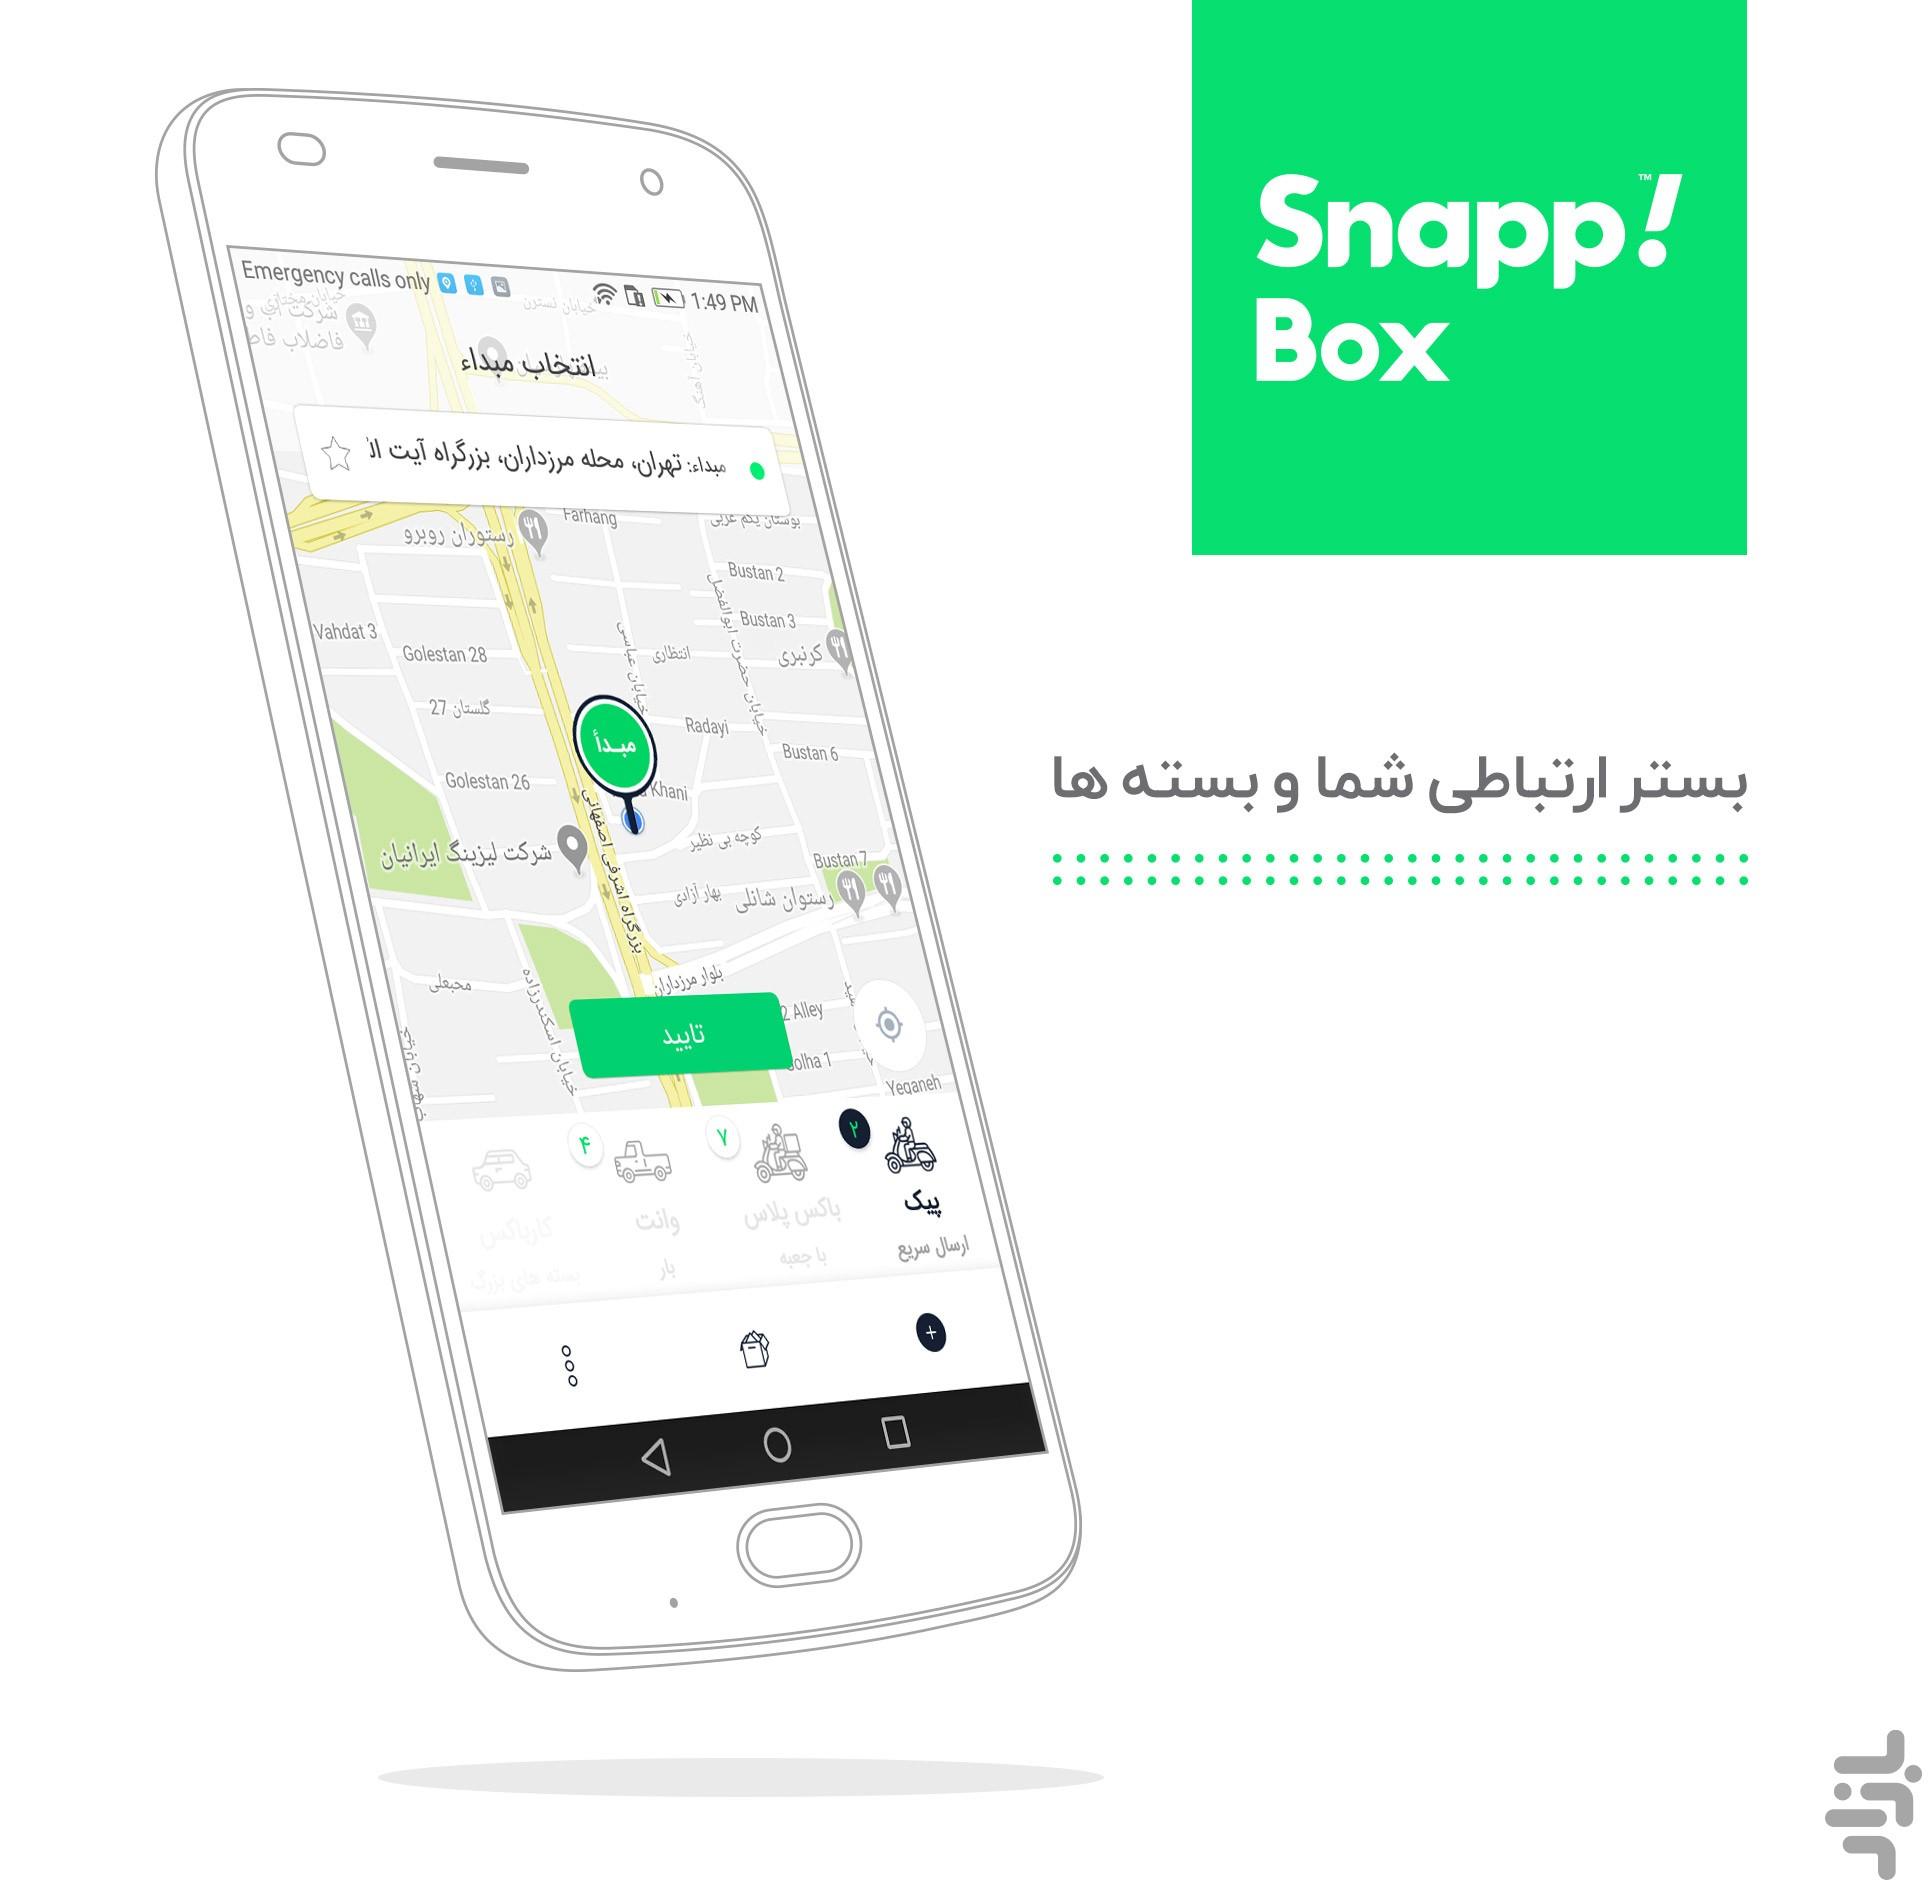 اسنپ باکس | Snappbox | آزمایشی for Android - Download | Cafe